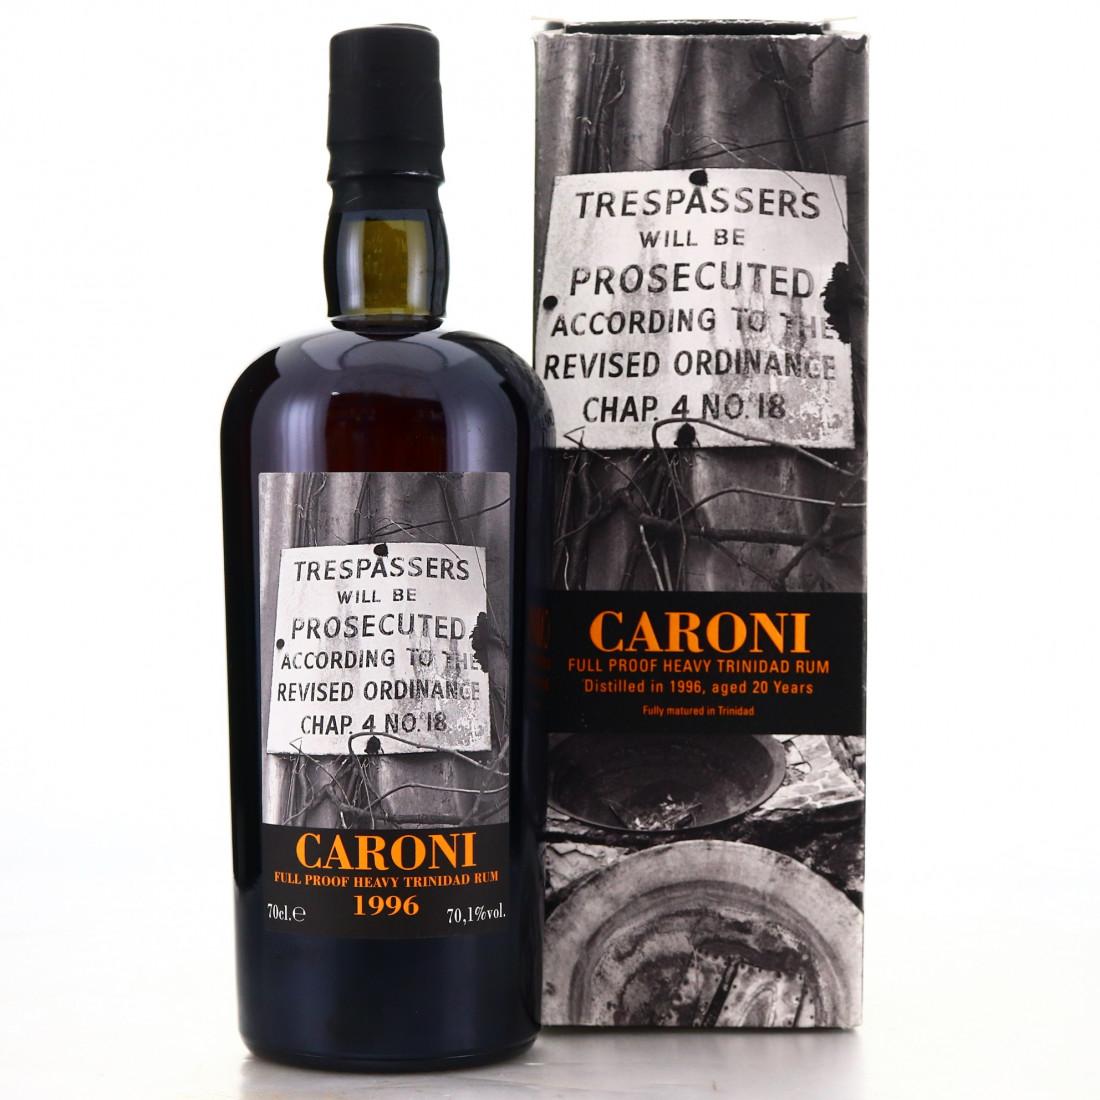 Caroni 1996 Velier 20 Year Old Full Proof Heavy